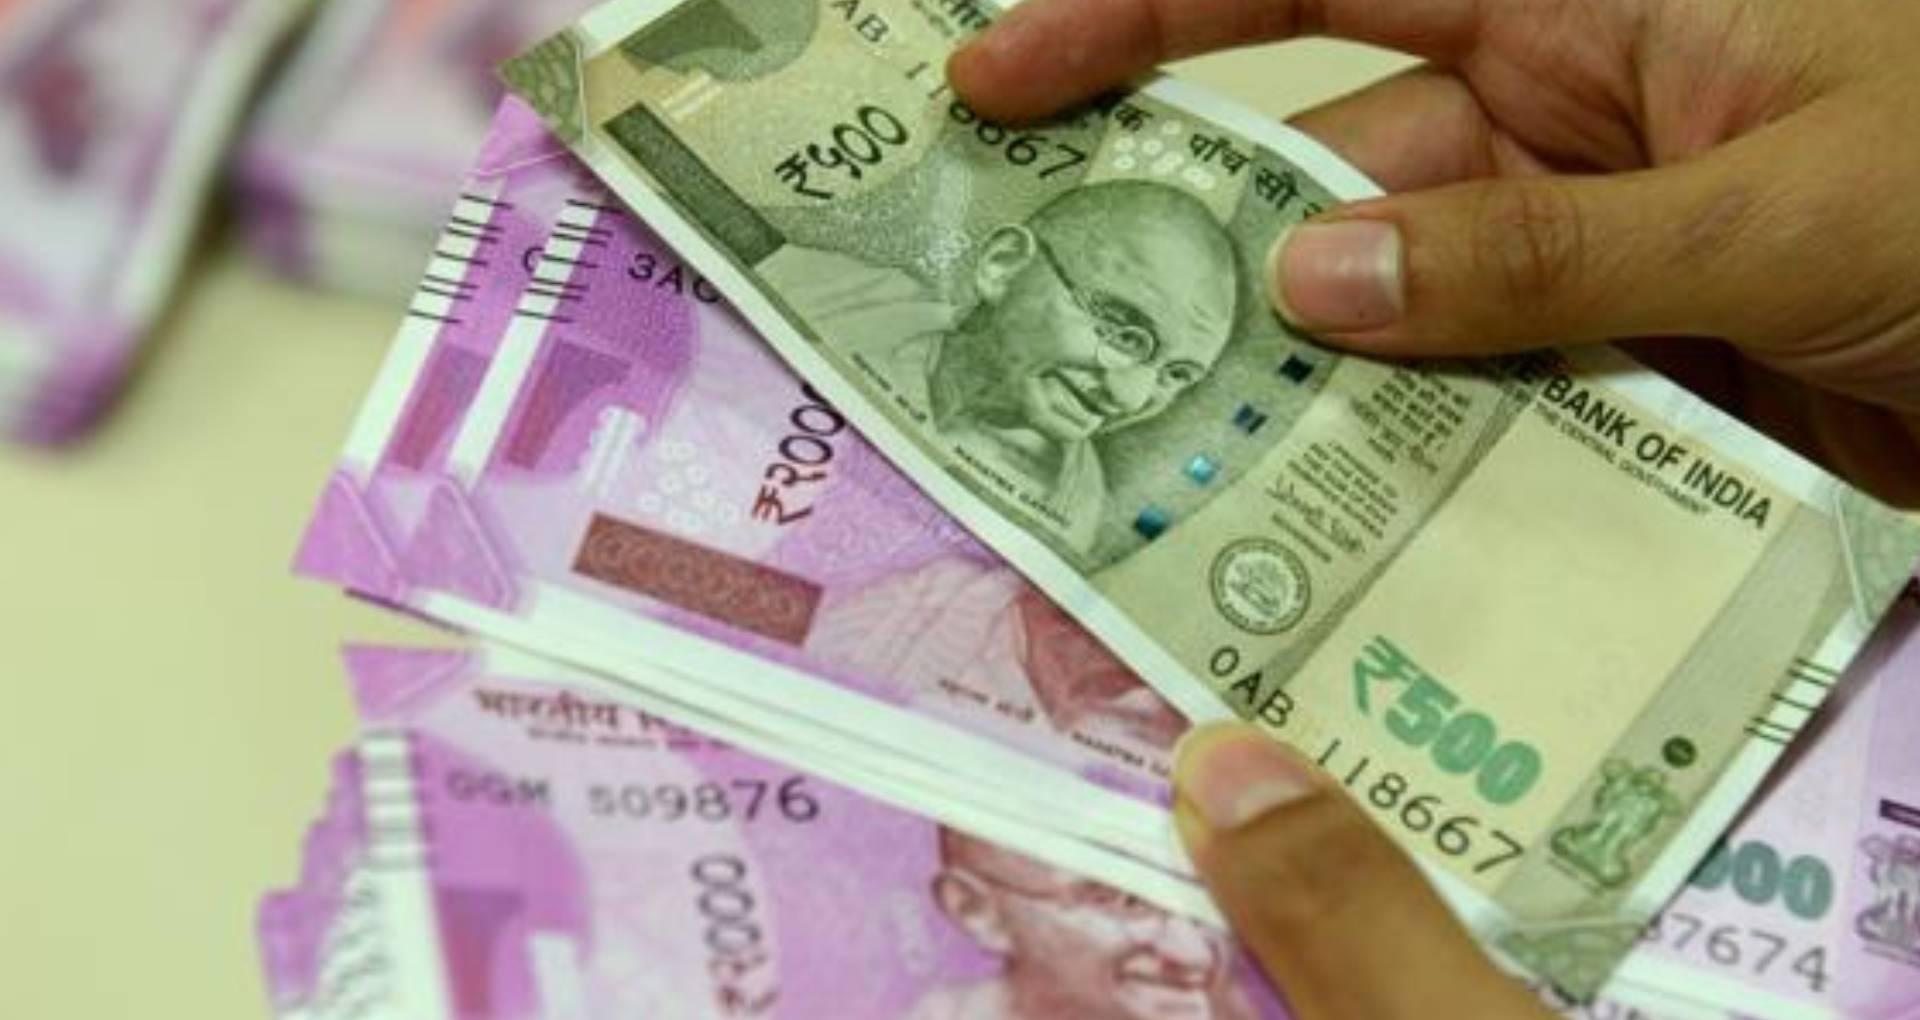 Kerala Win Win Lottery W-533 Result Announced: केरल विन विन लॉटरी का आया रिजल्ट, ये लोग बन घर बैठे लखपति